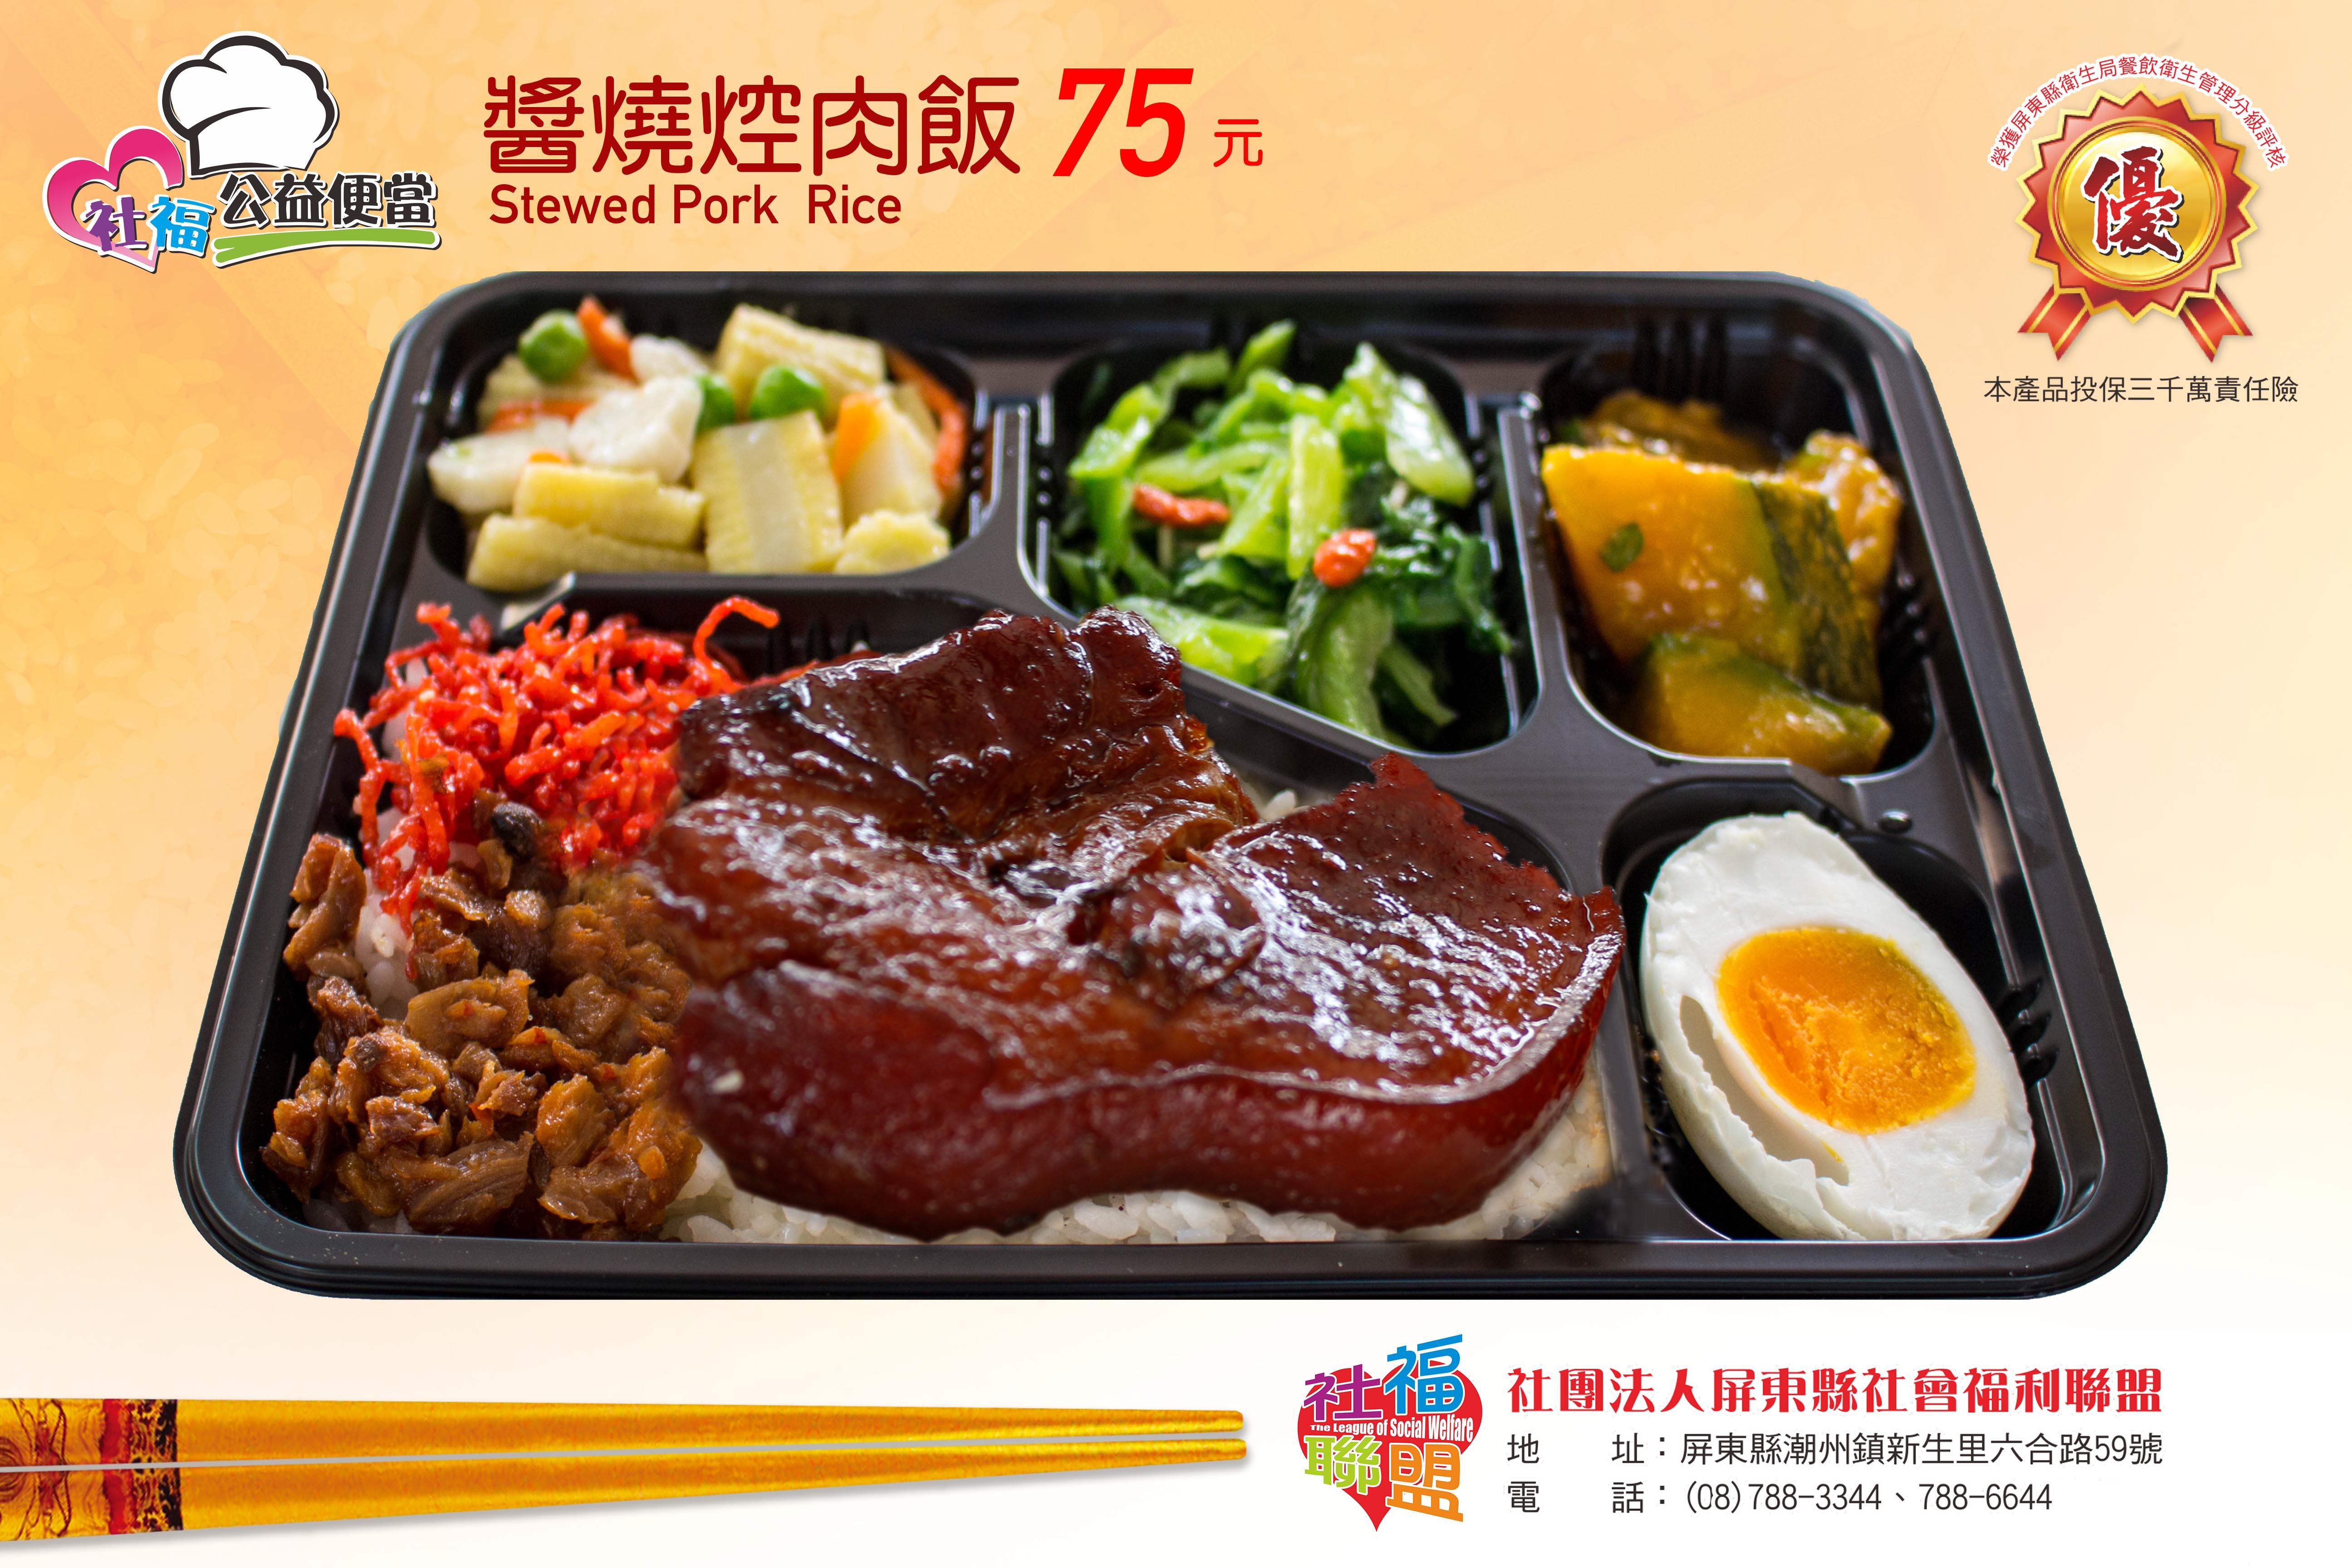 Stewed Pork Rice75